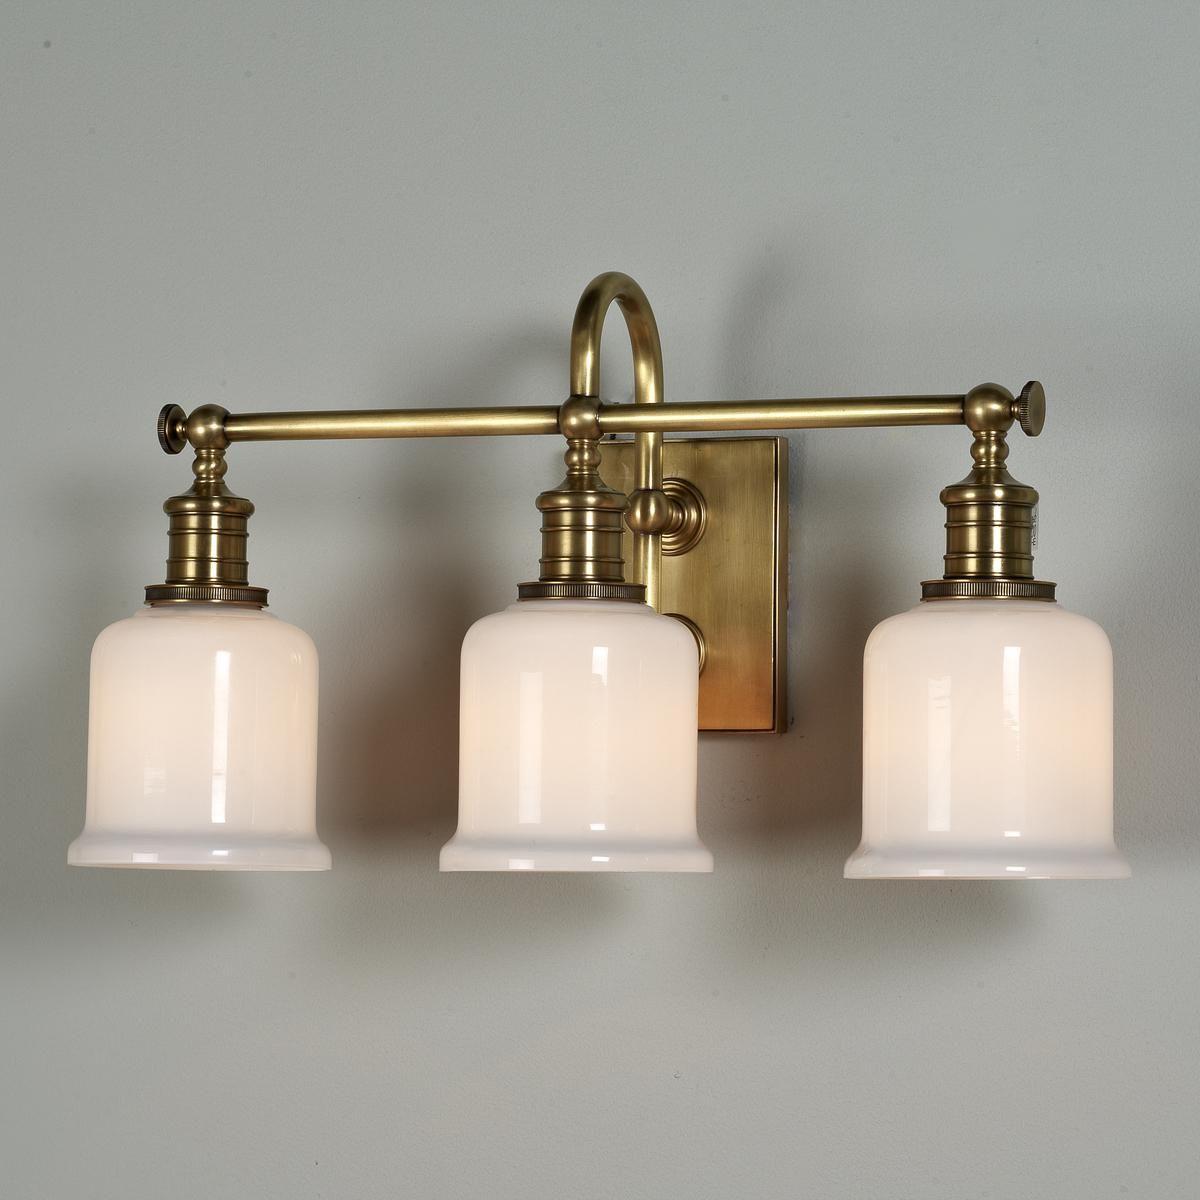 Well Appointed Bath Light Light Bath Light Polished Chrome - Antique brass bathroom light fixtures for bathroom decor ideas